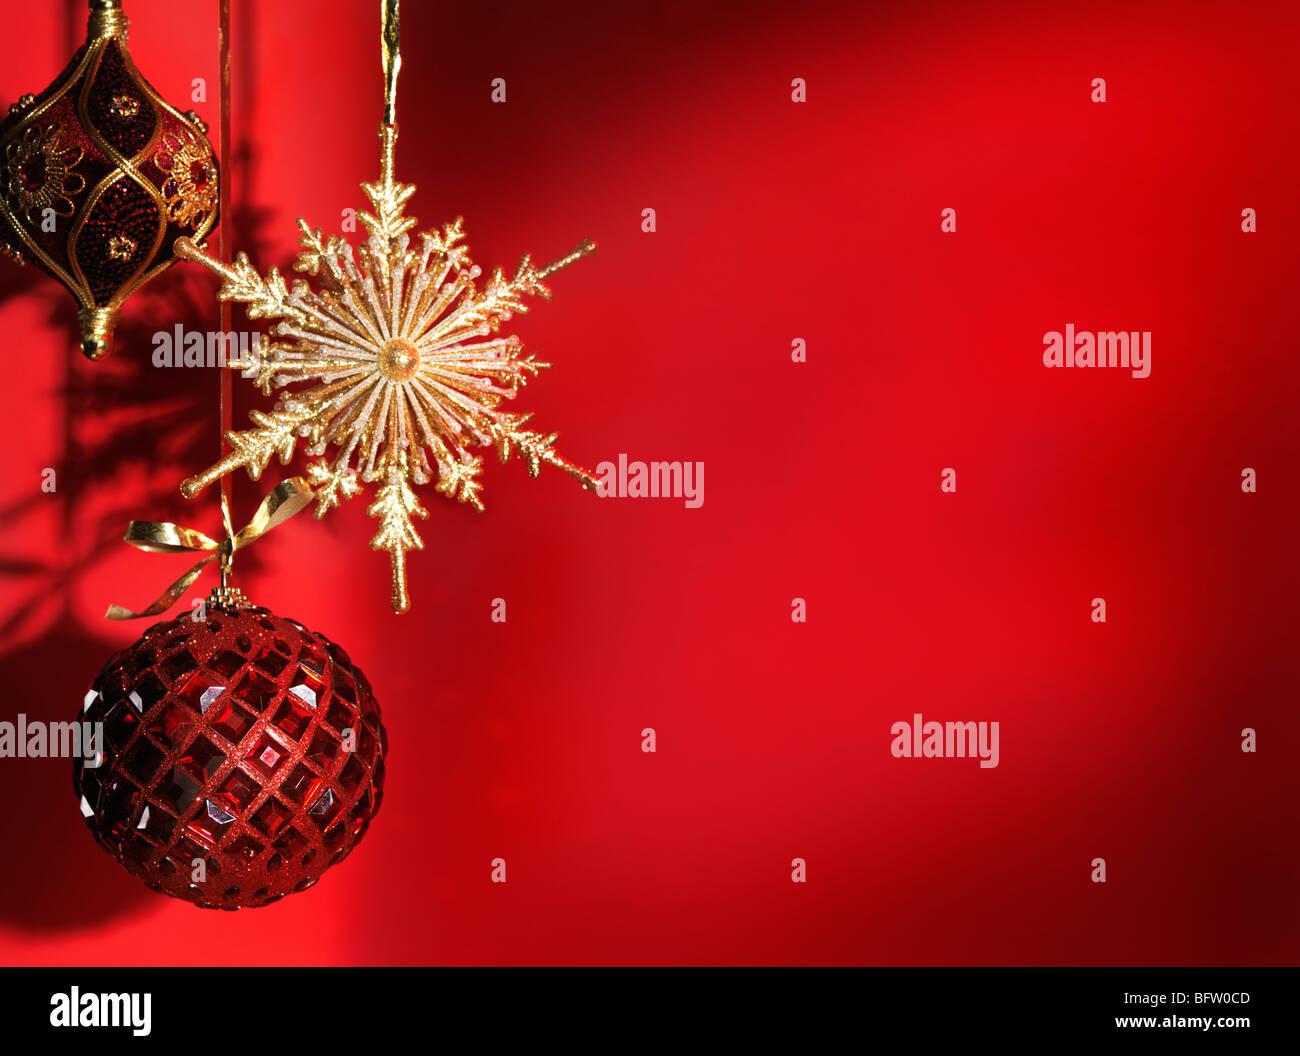 Beautiful Christmas decoration artistic still life background - Stock Image